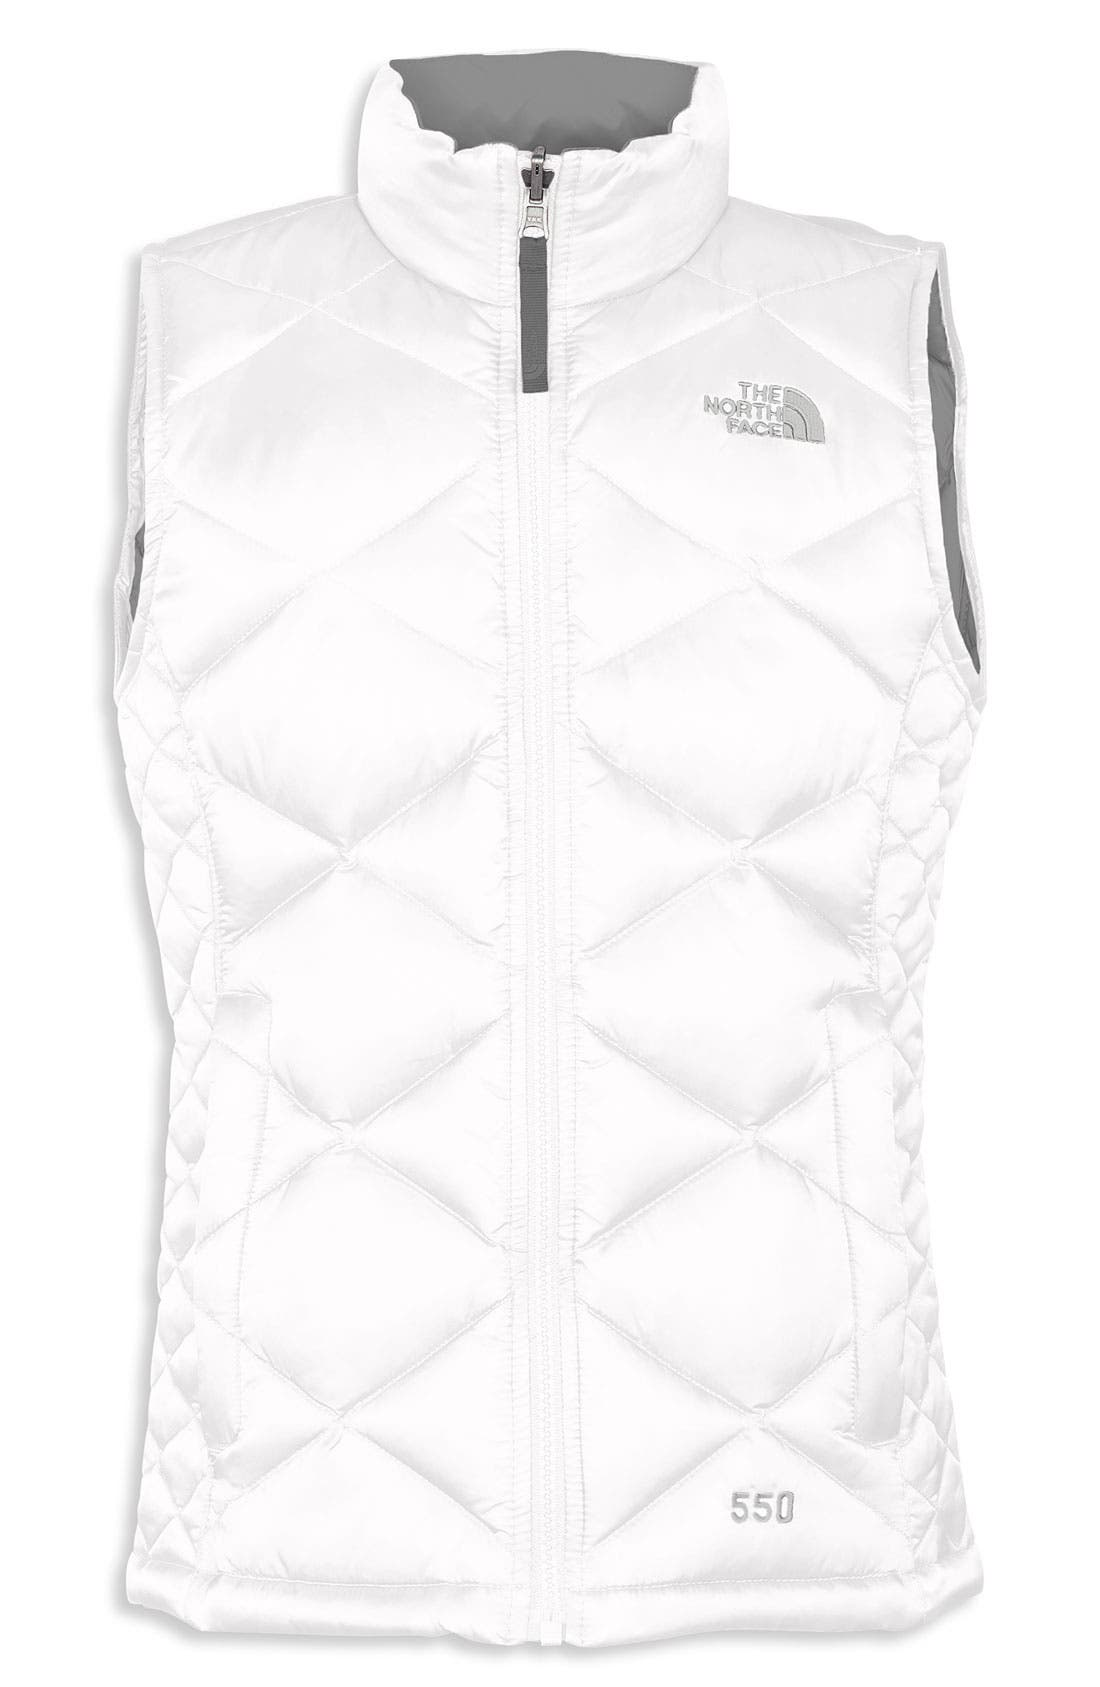 Alternate Image 1 Selected - The North Face Vest (Big Girls)